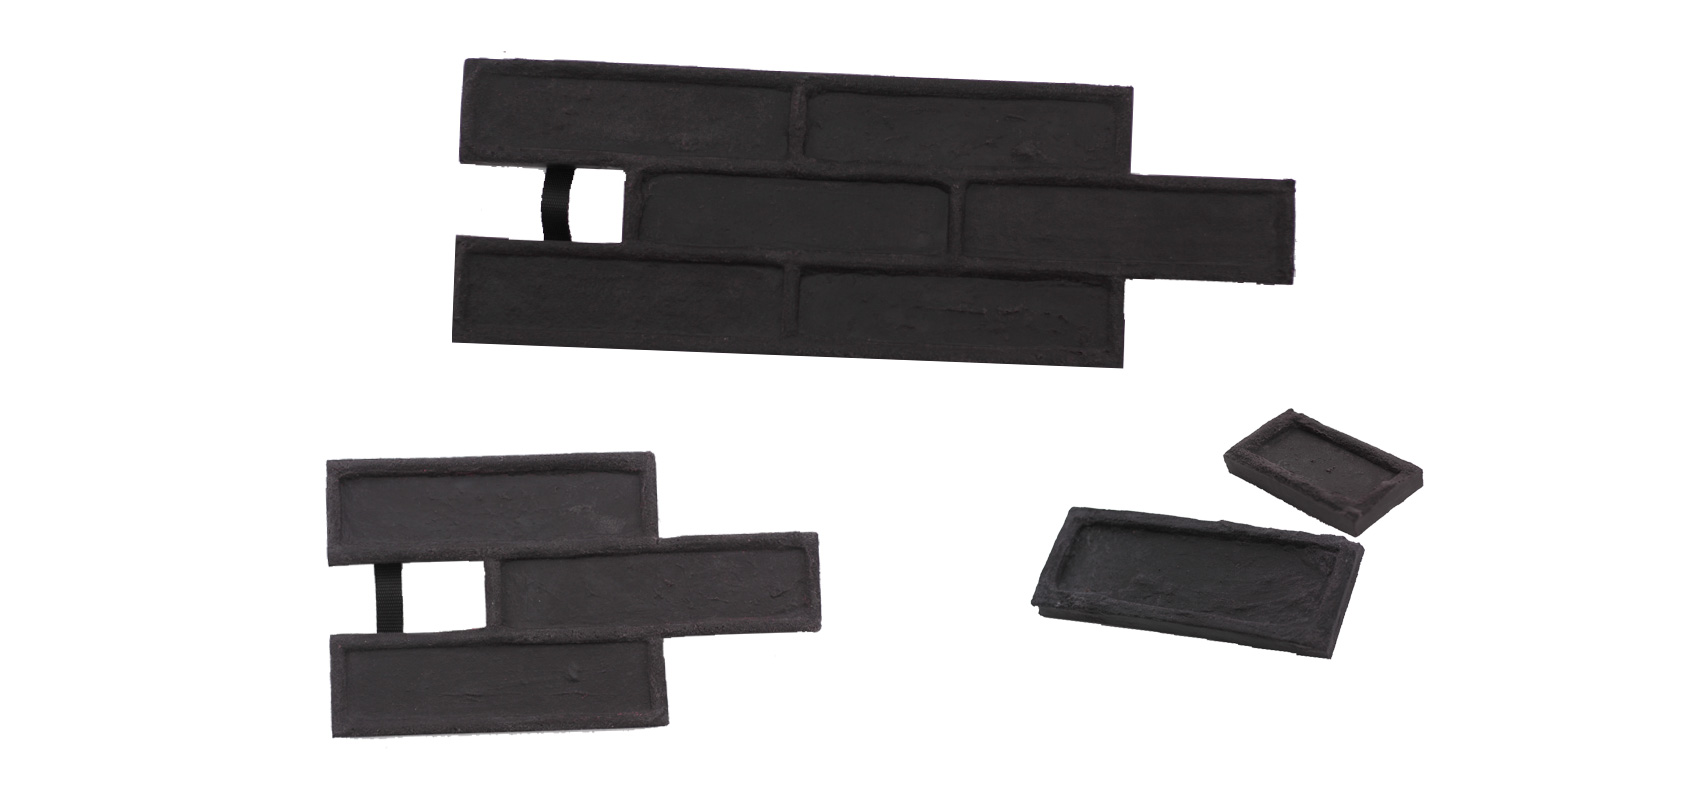 STAMP® Tehla Classic SET2 - 4 profesionálne raznice na výrobu obkladu 4 ks tc0,5+1 a tc3 a tc6